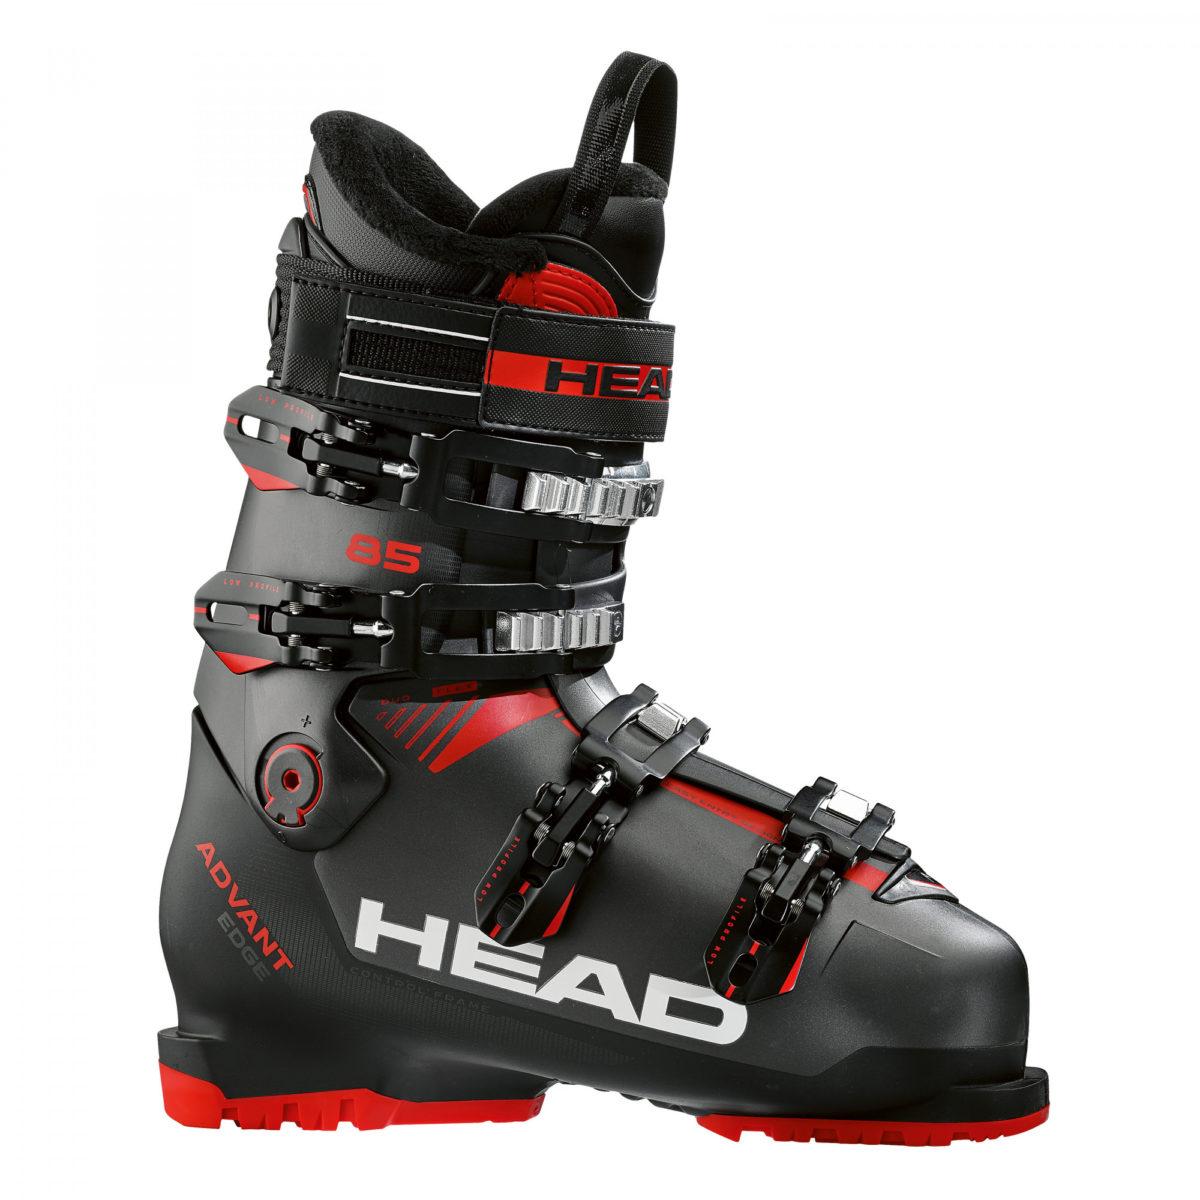 HEAD ADVANT EDGE 85 Ботинки горнолыжные 609272 - 1